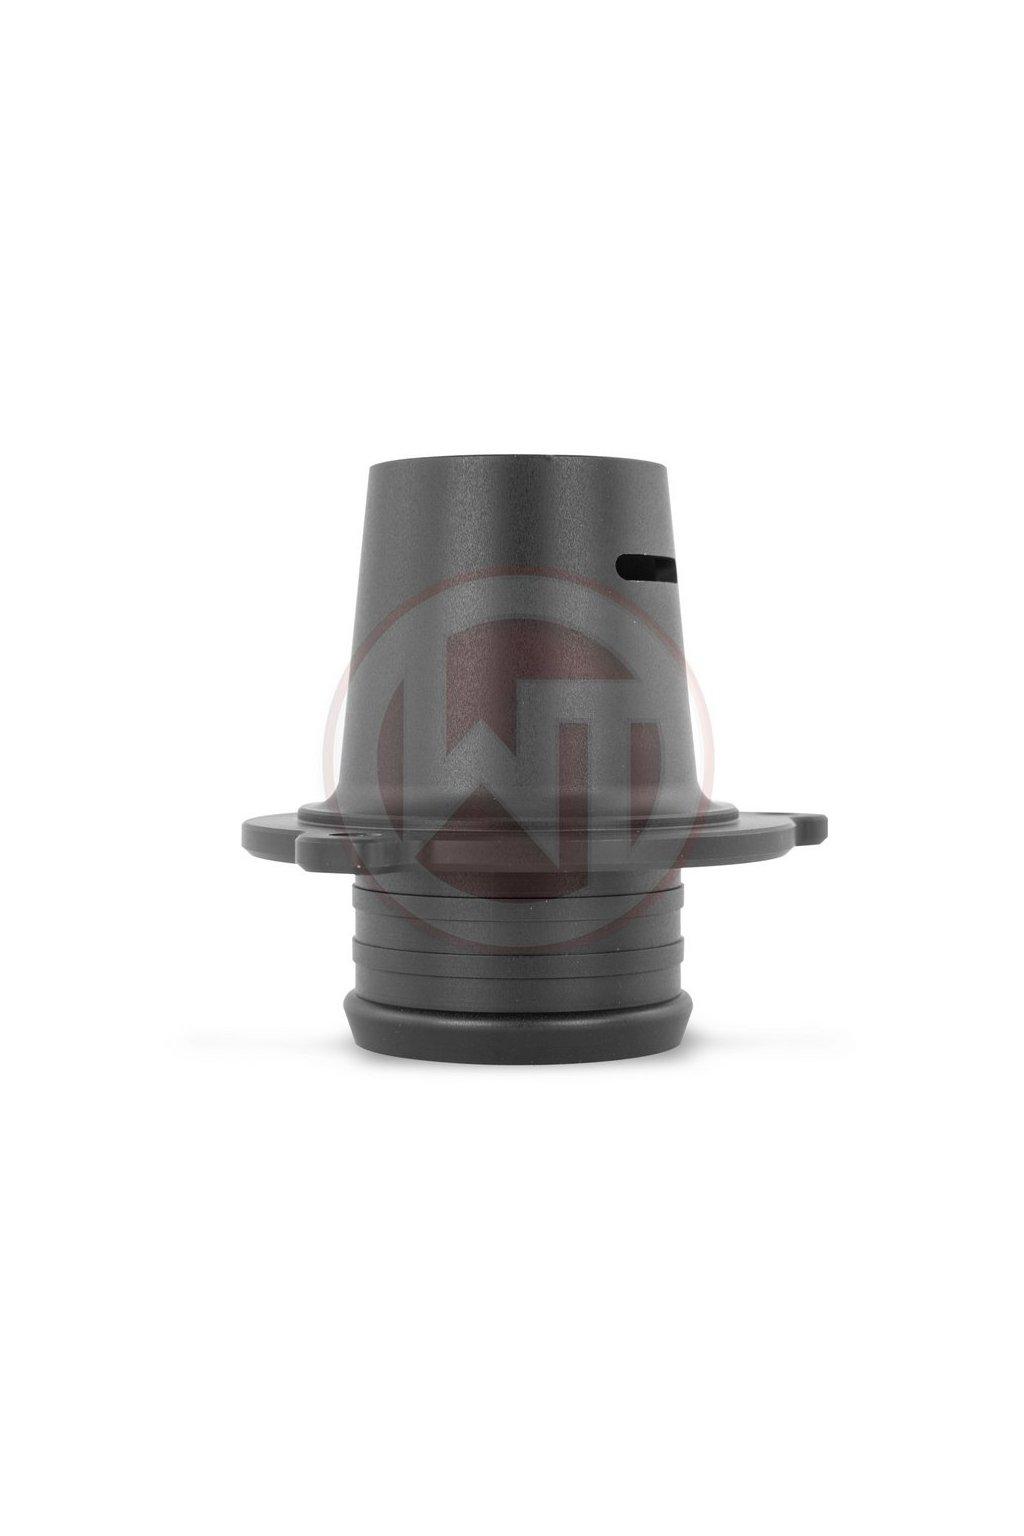 Wagner Tuning turbo muffler delete Octavia 4 RS / Golf 8 GTI / Cupra Leon 4 2.0TSI 180KW